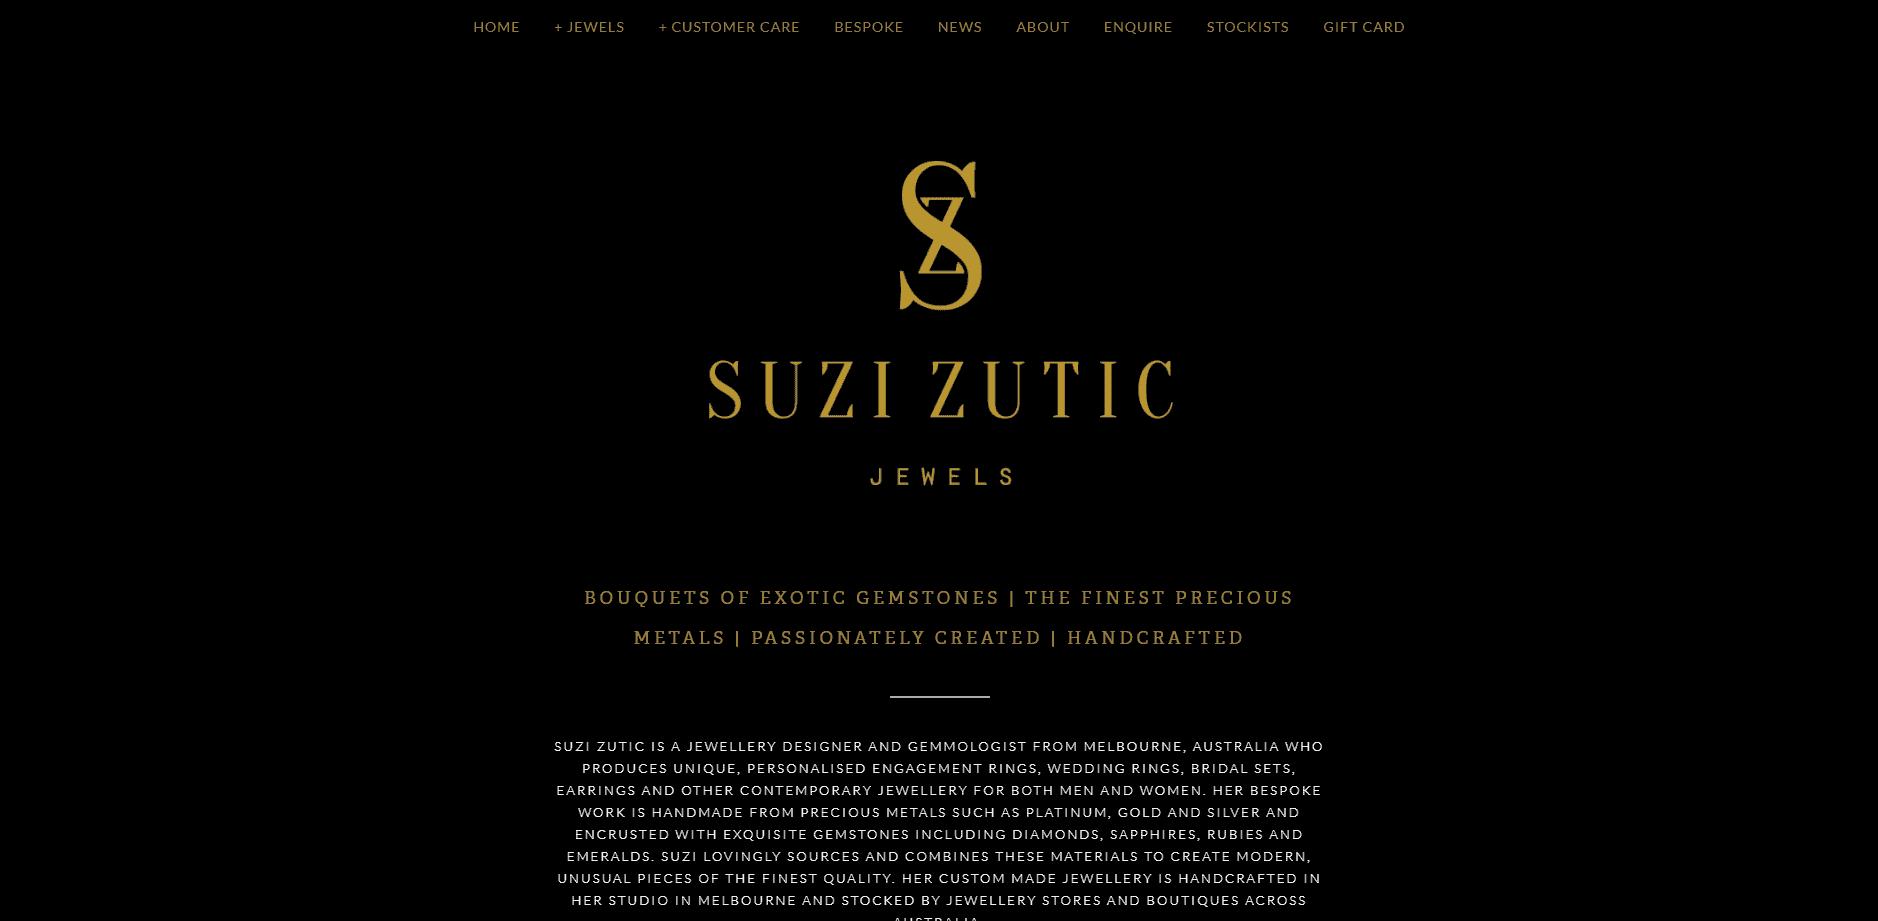 Suzi Zutic